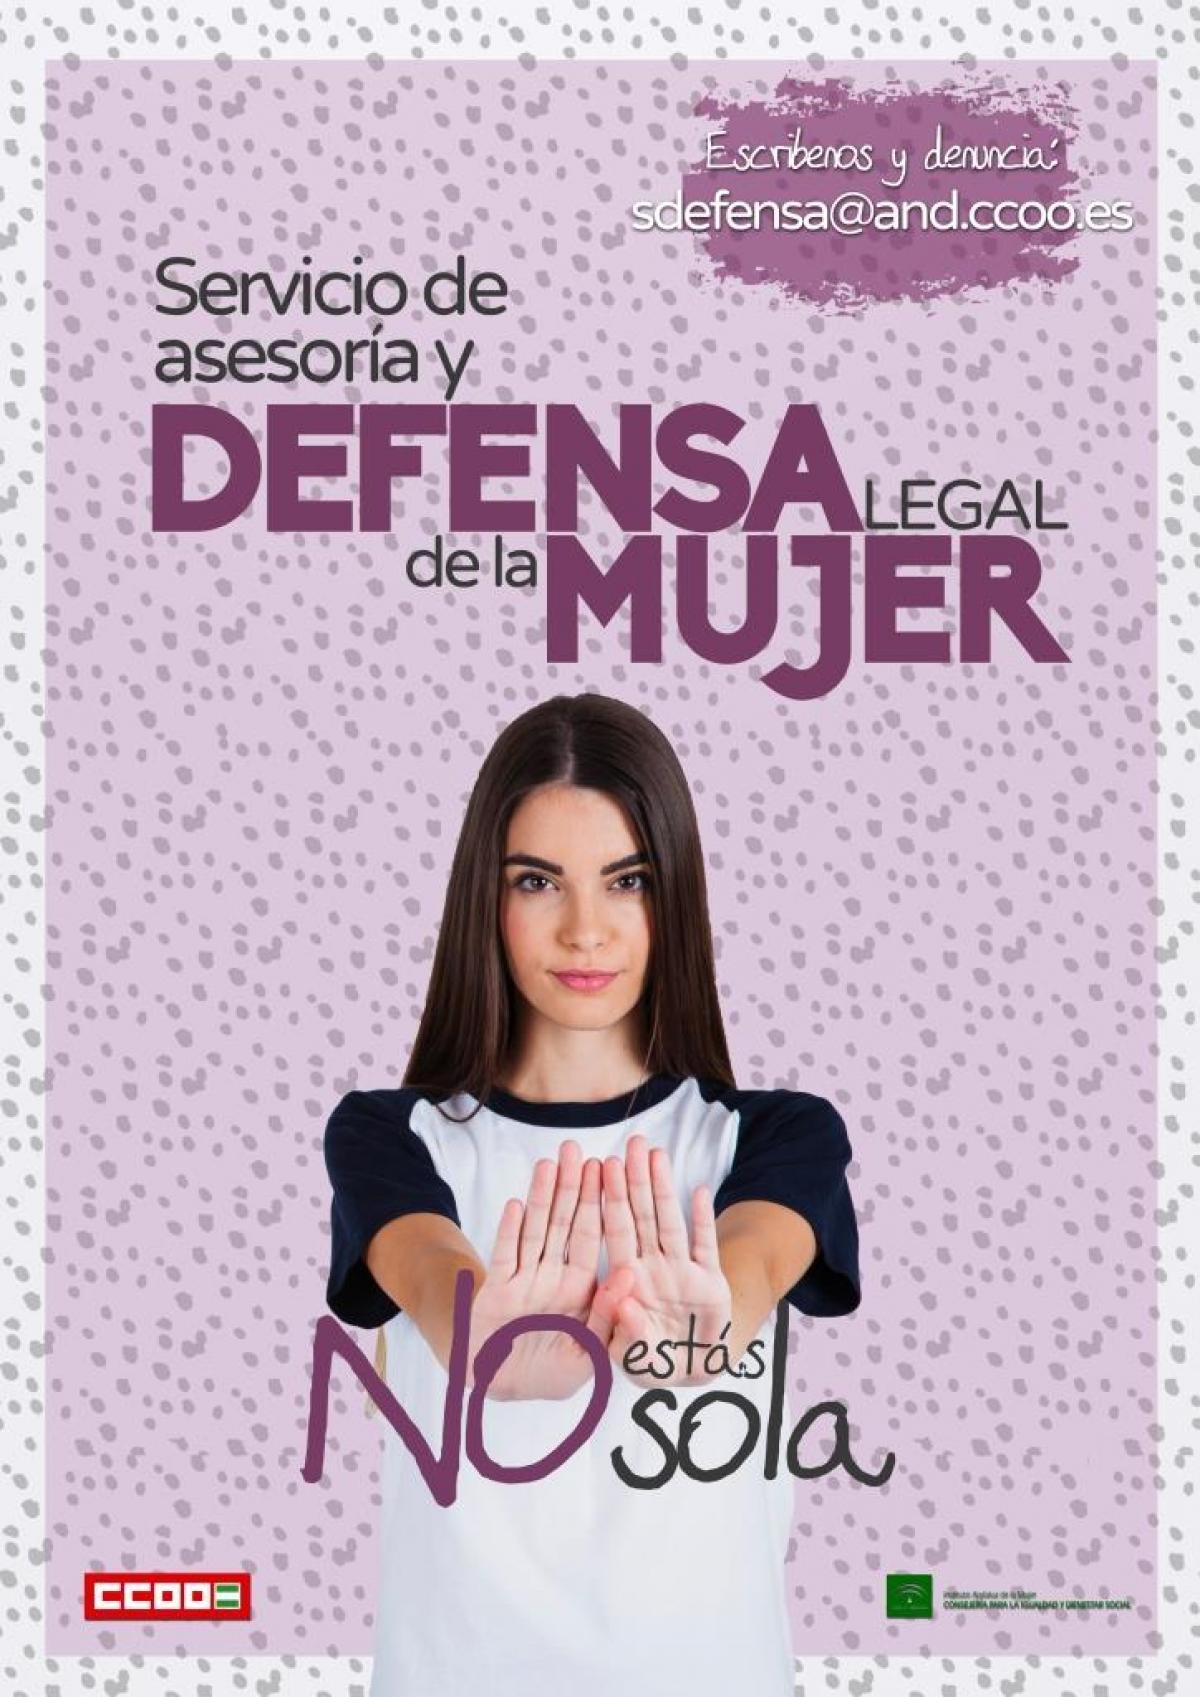 CCOO Andalucia ofrece Defensa Legal gratuita en caso de discriminación laboral por razón de género